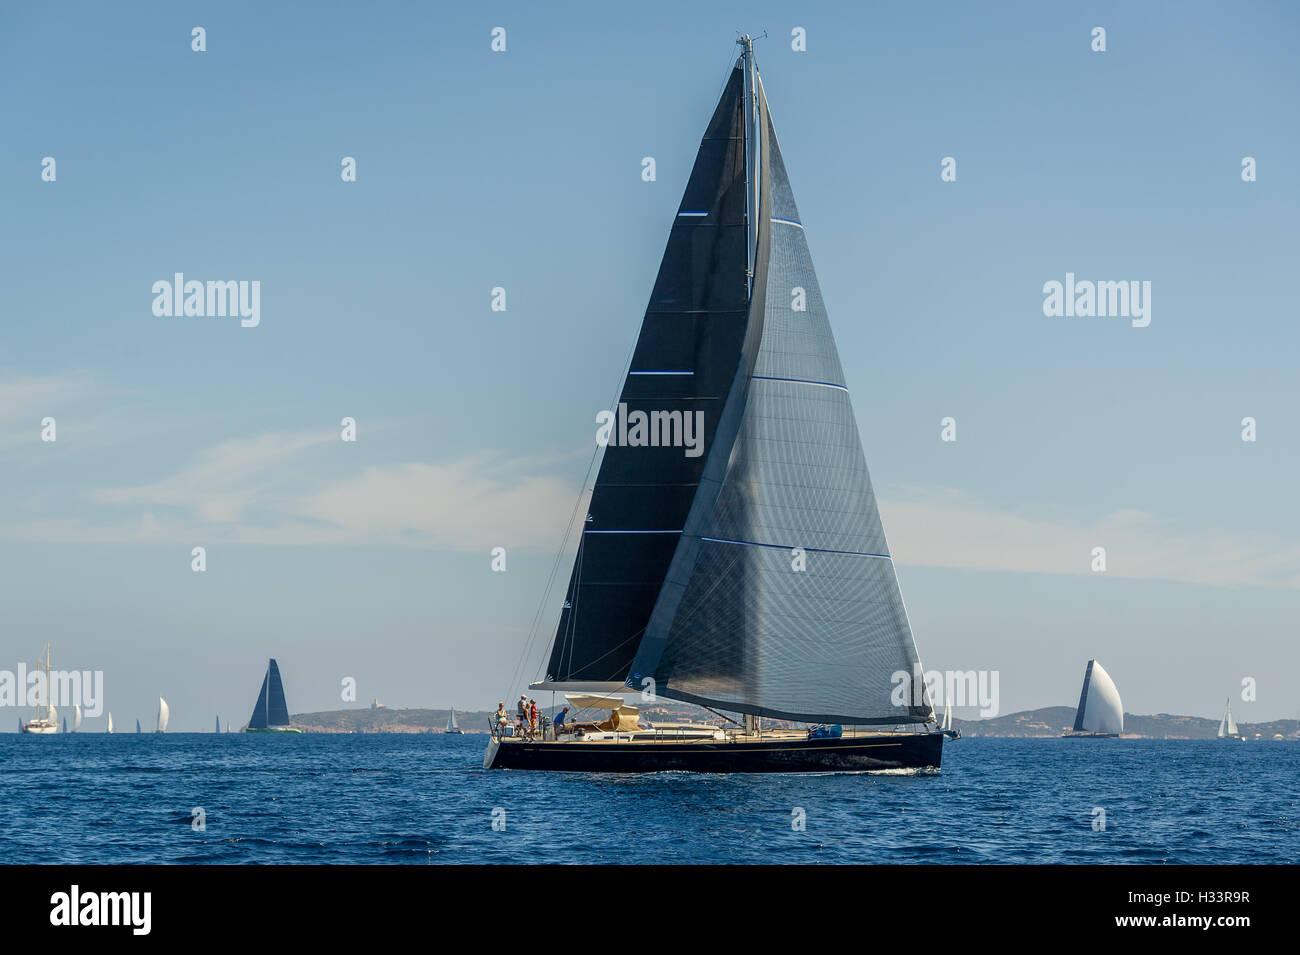 Luxury big sailing yacht with black sails. - Stock Image